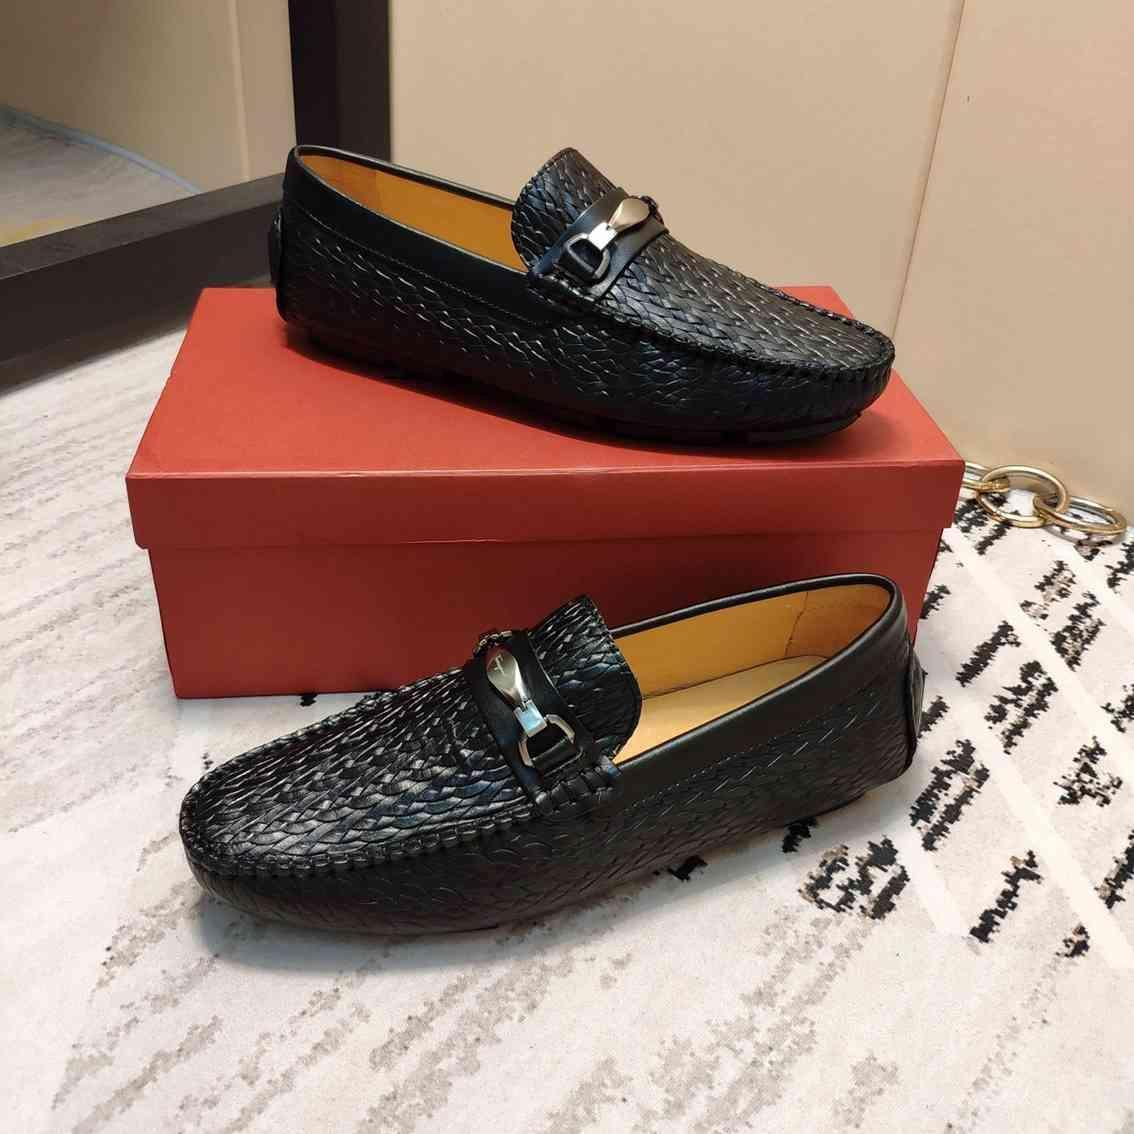 2019Designer Hommes Luxe Chaussures Baskets SneakersFerragamo 2020 chaussures pour hommes 38-45 1127-7